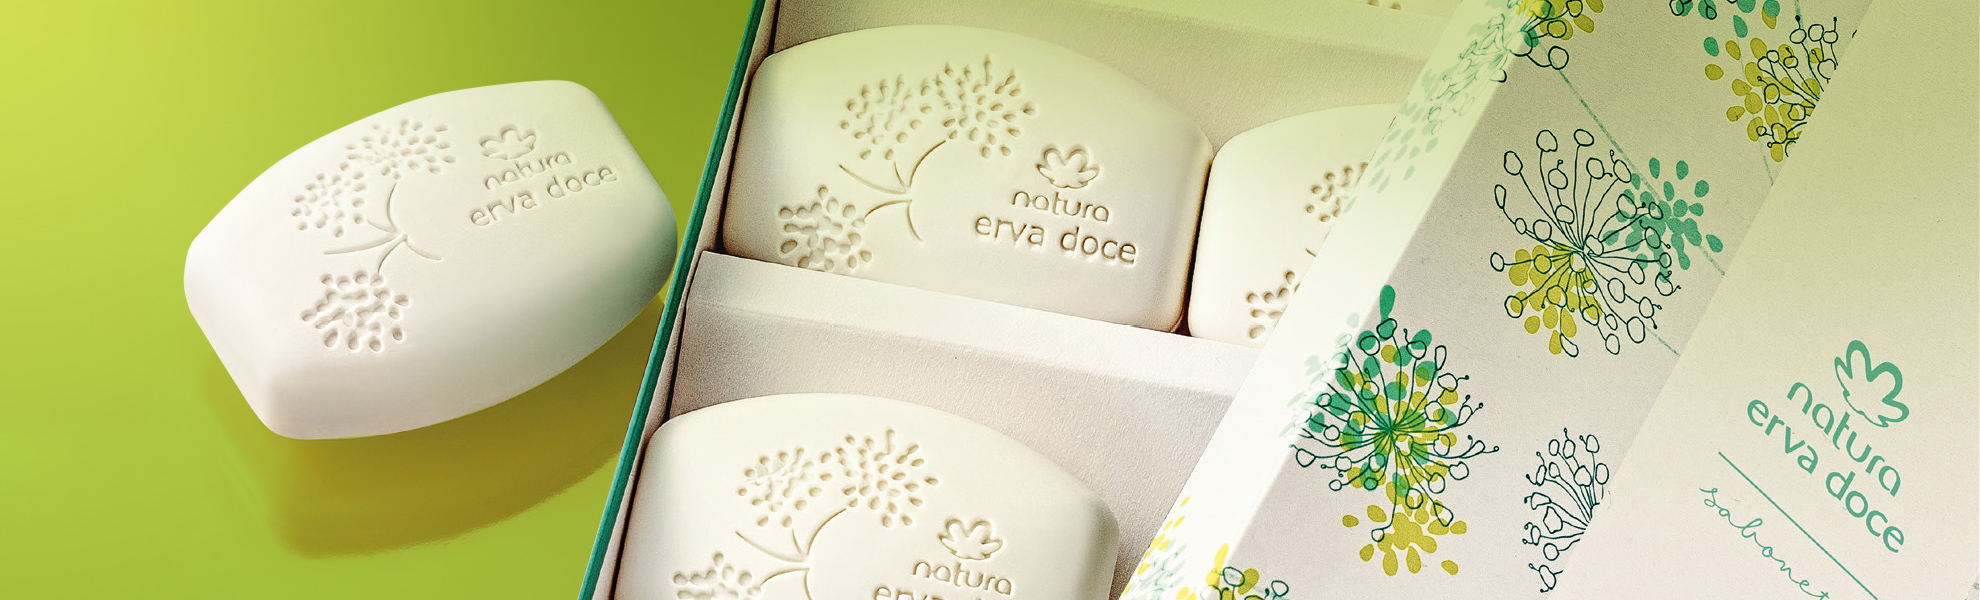 chelles-e-hayashi-design-portfolio-natura-erva-doce-soap-bars-product-packaging-graphic